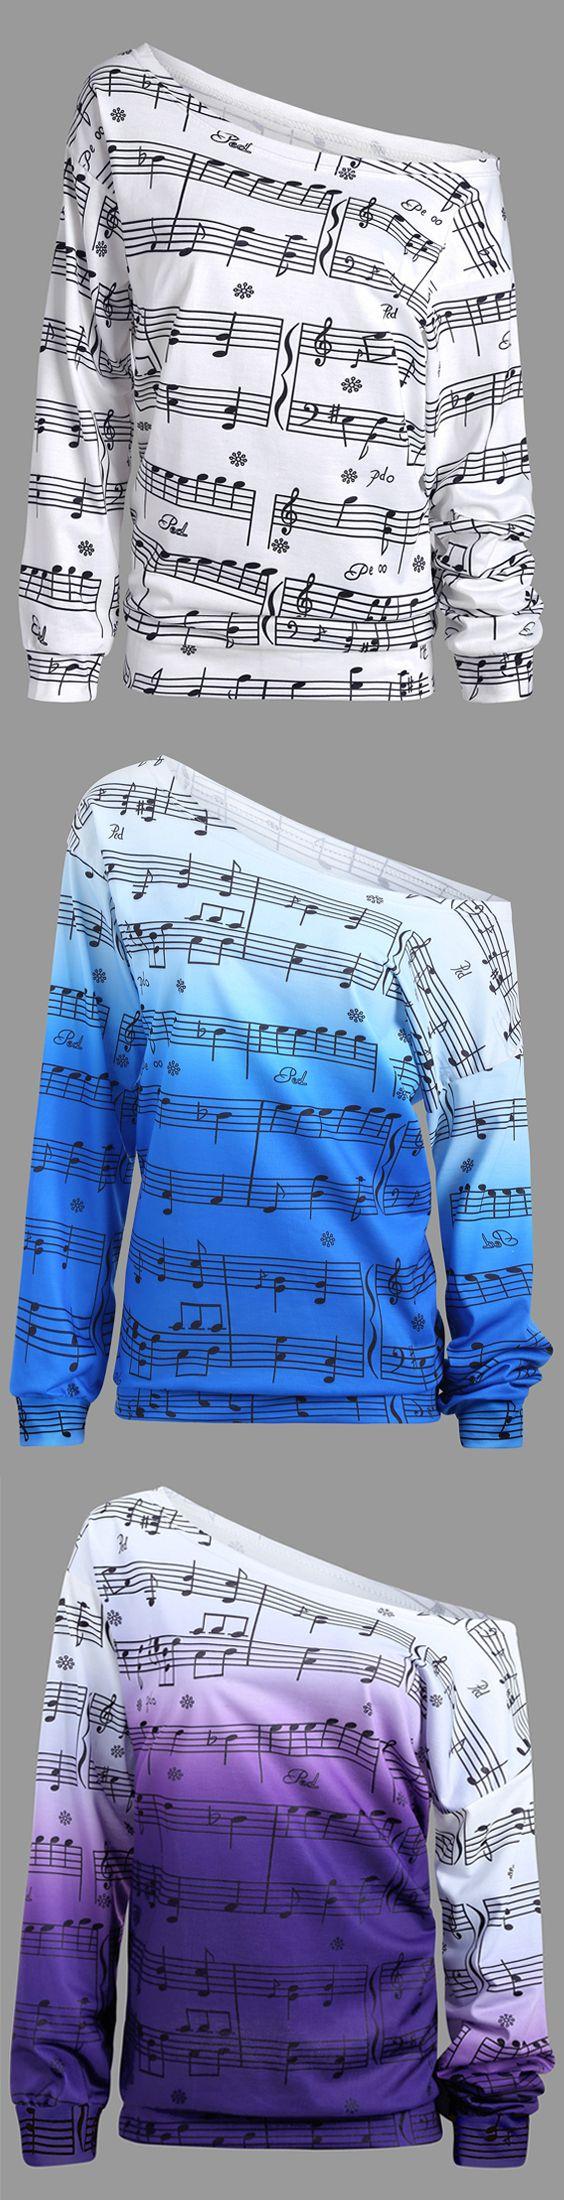 Long Sleeve Musical Notes Print Sweatshirt